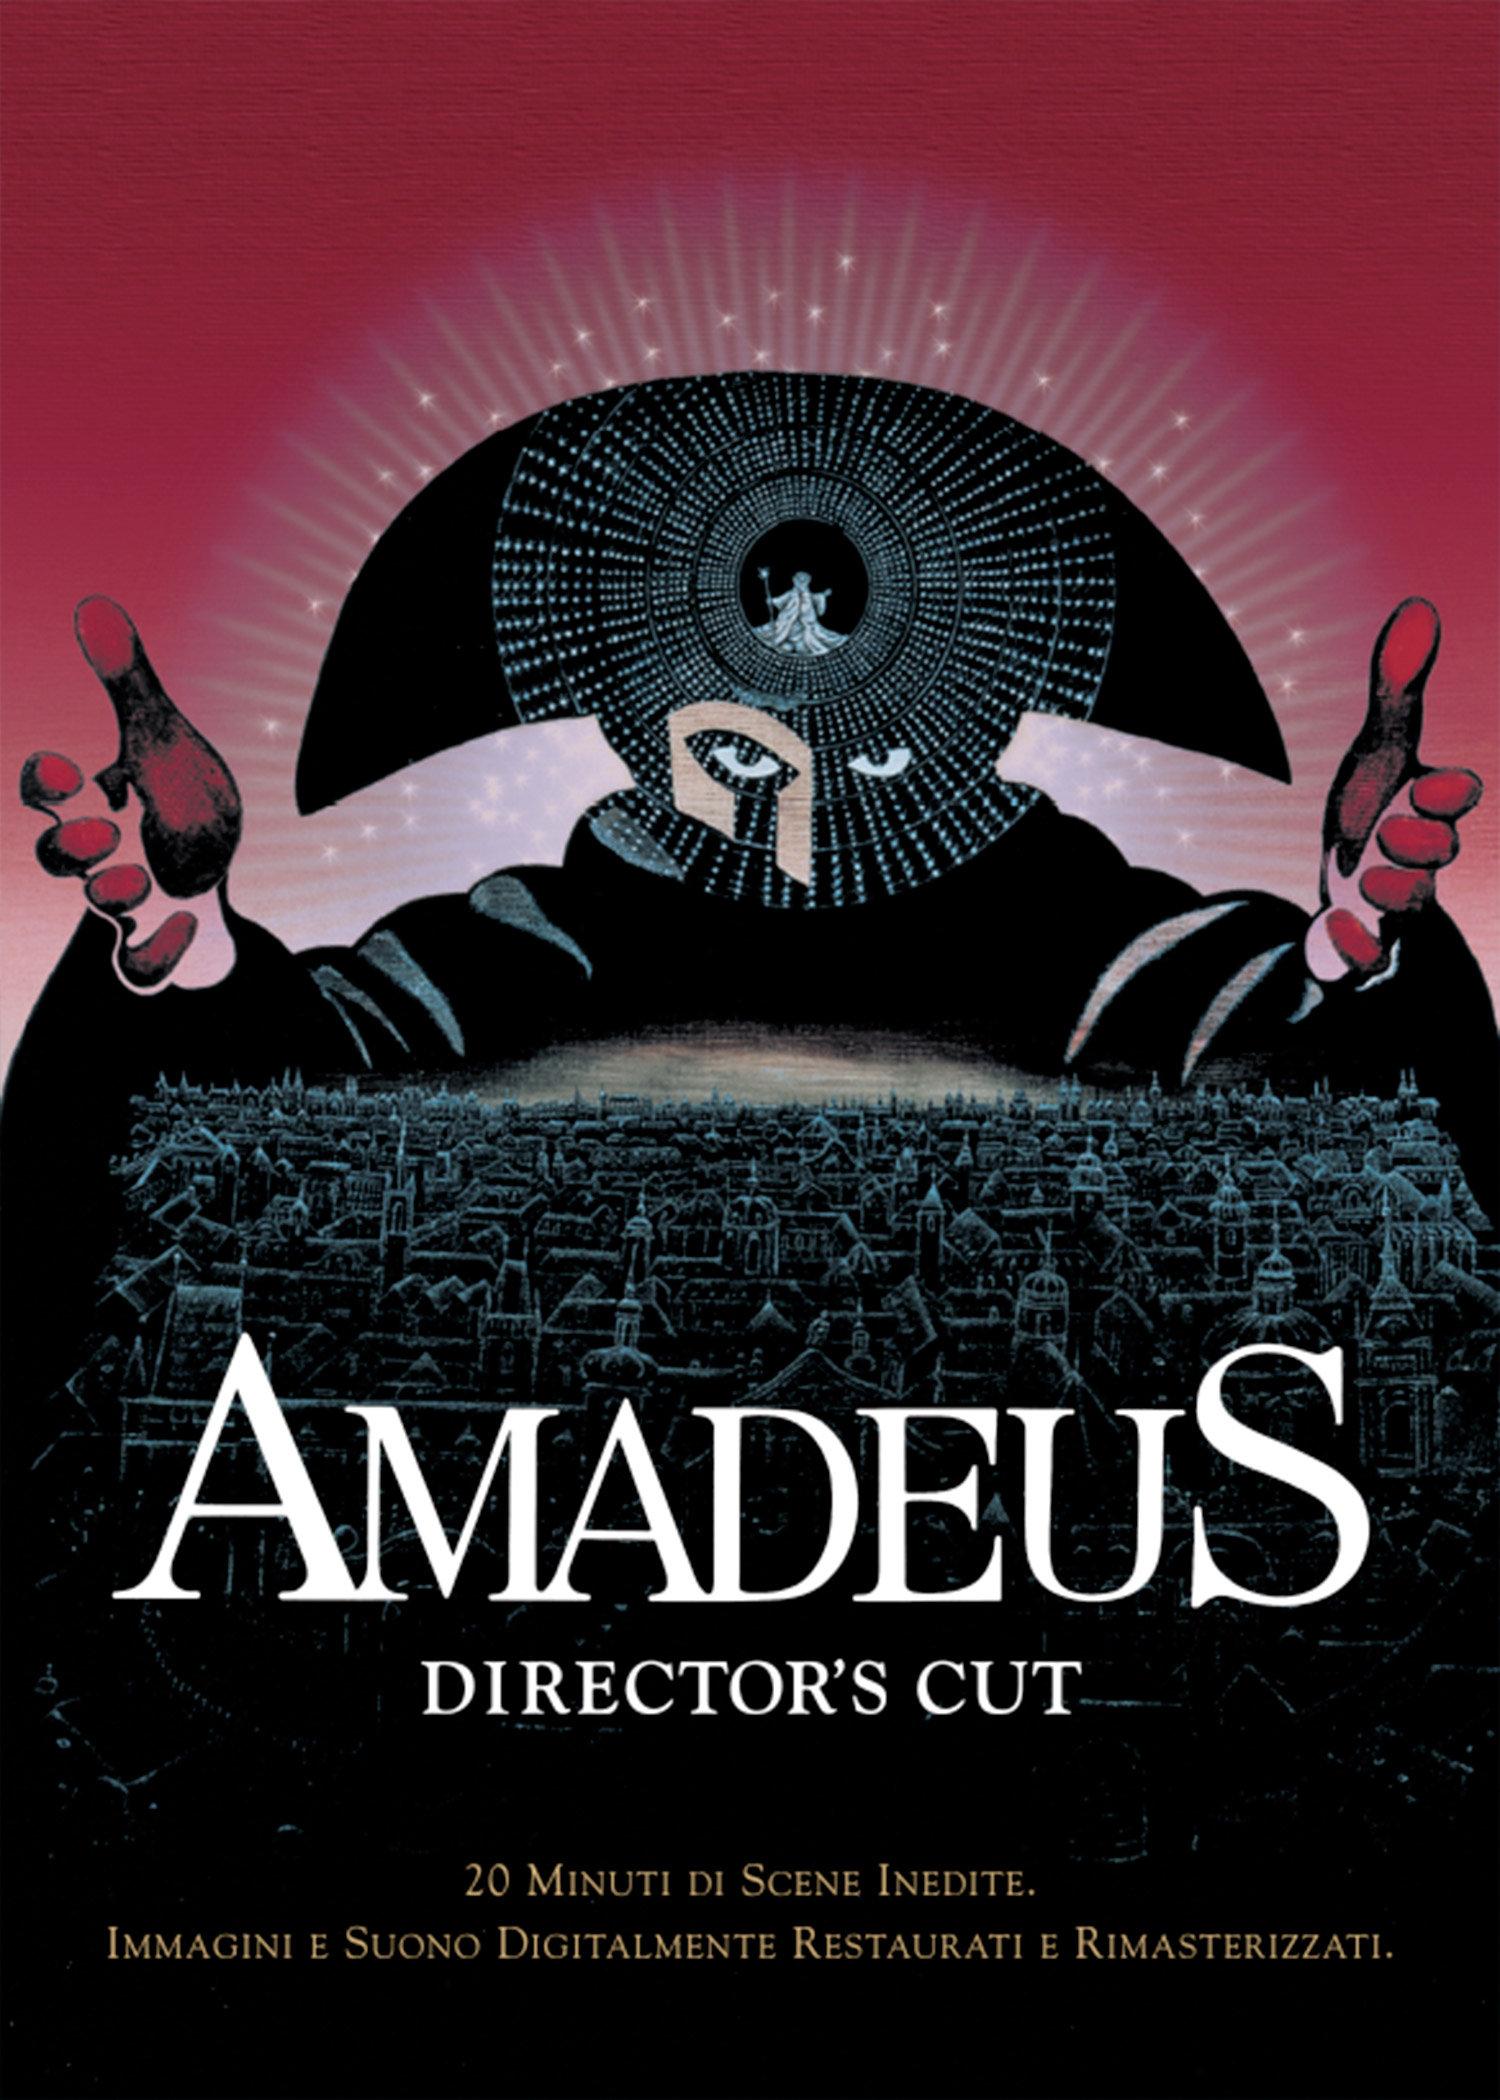 Image of Amadeus: Director's Cut